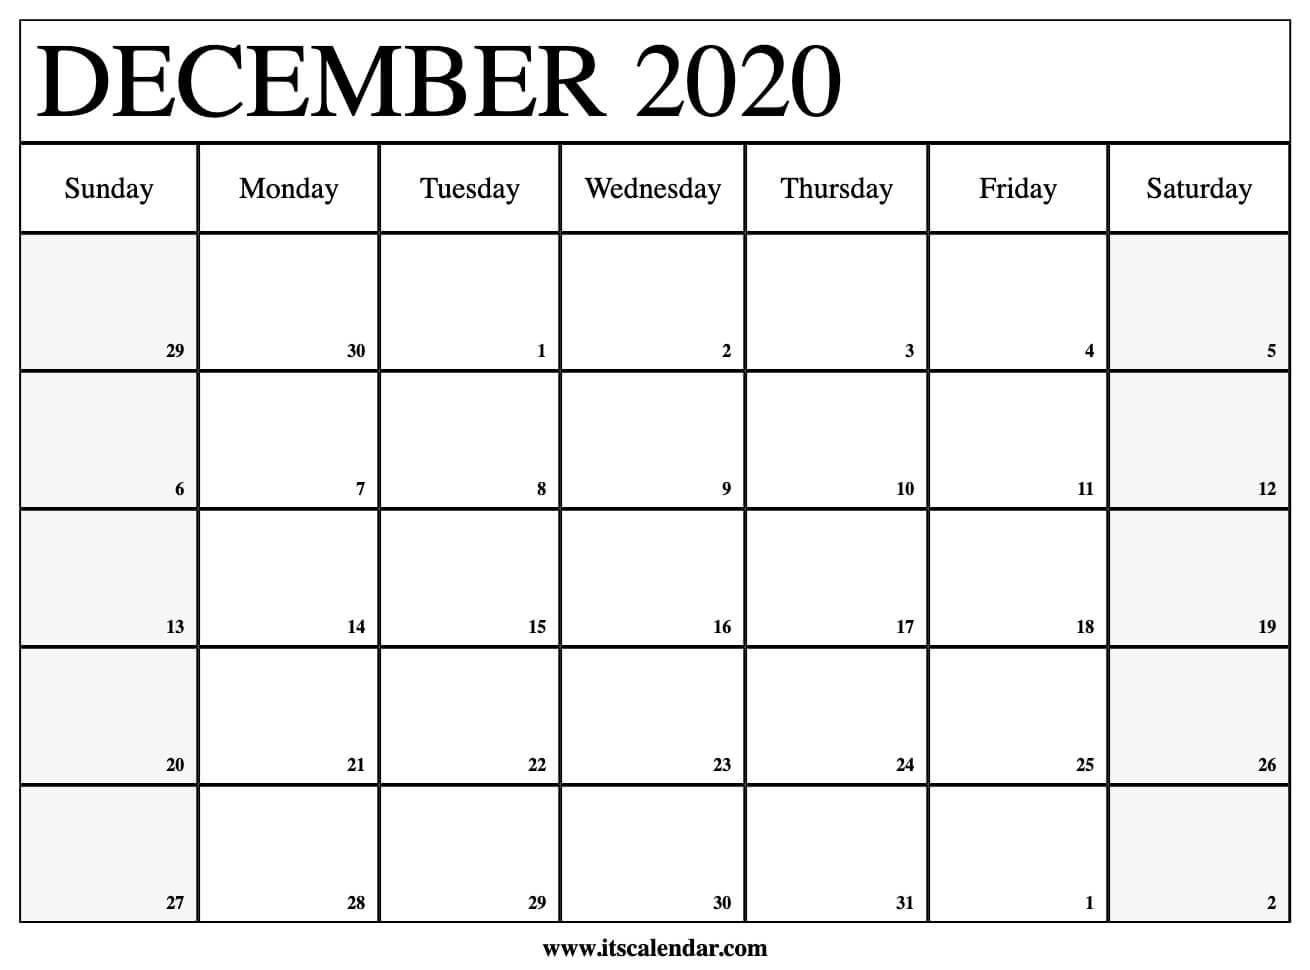 Printable Monthly Calendar December 2020 - Togo.wpart.co